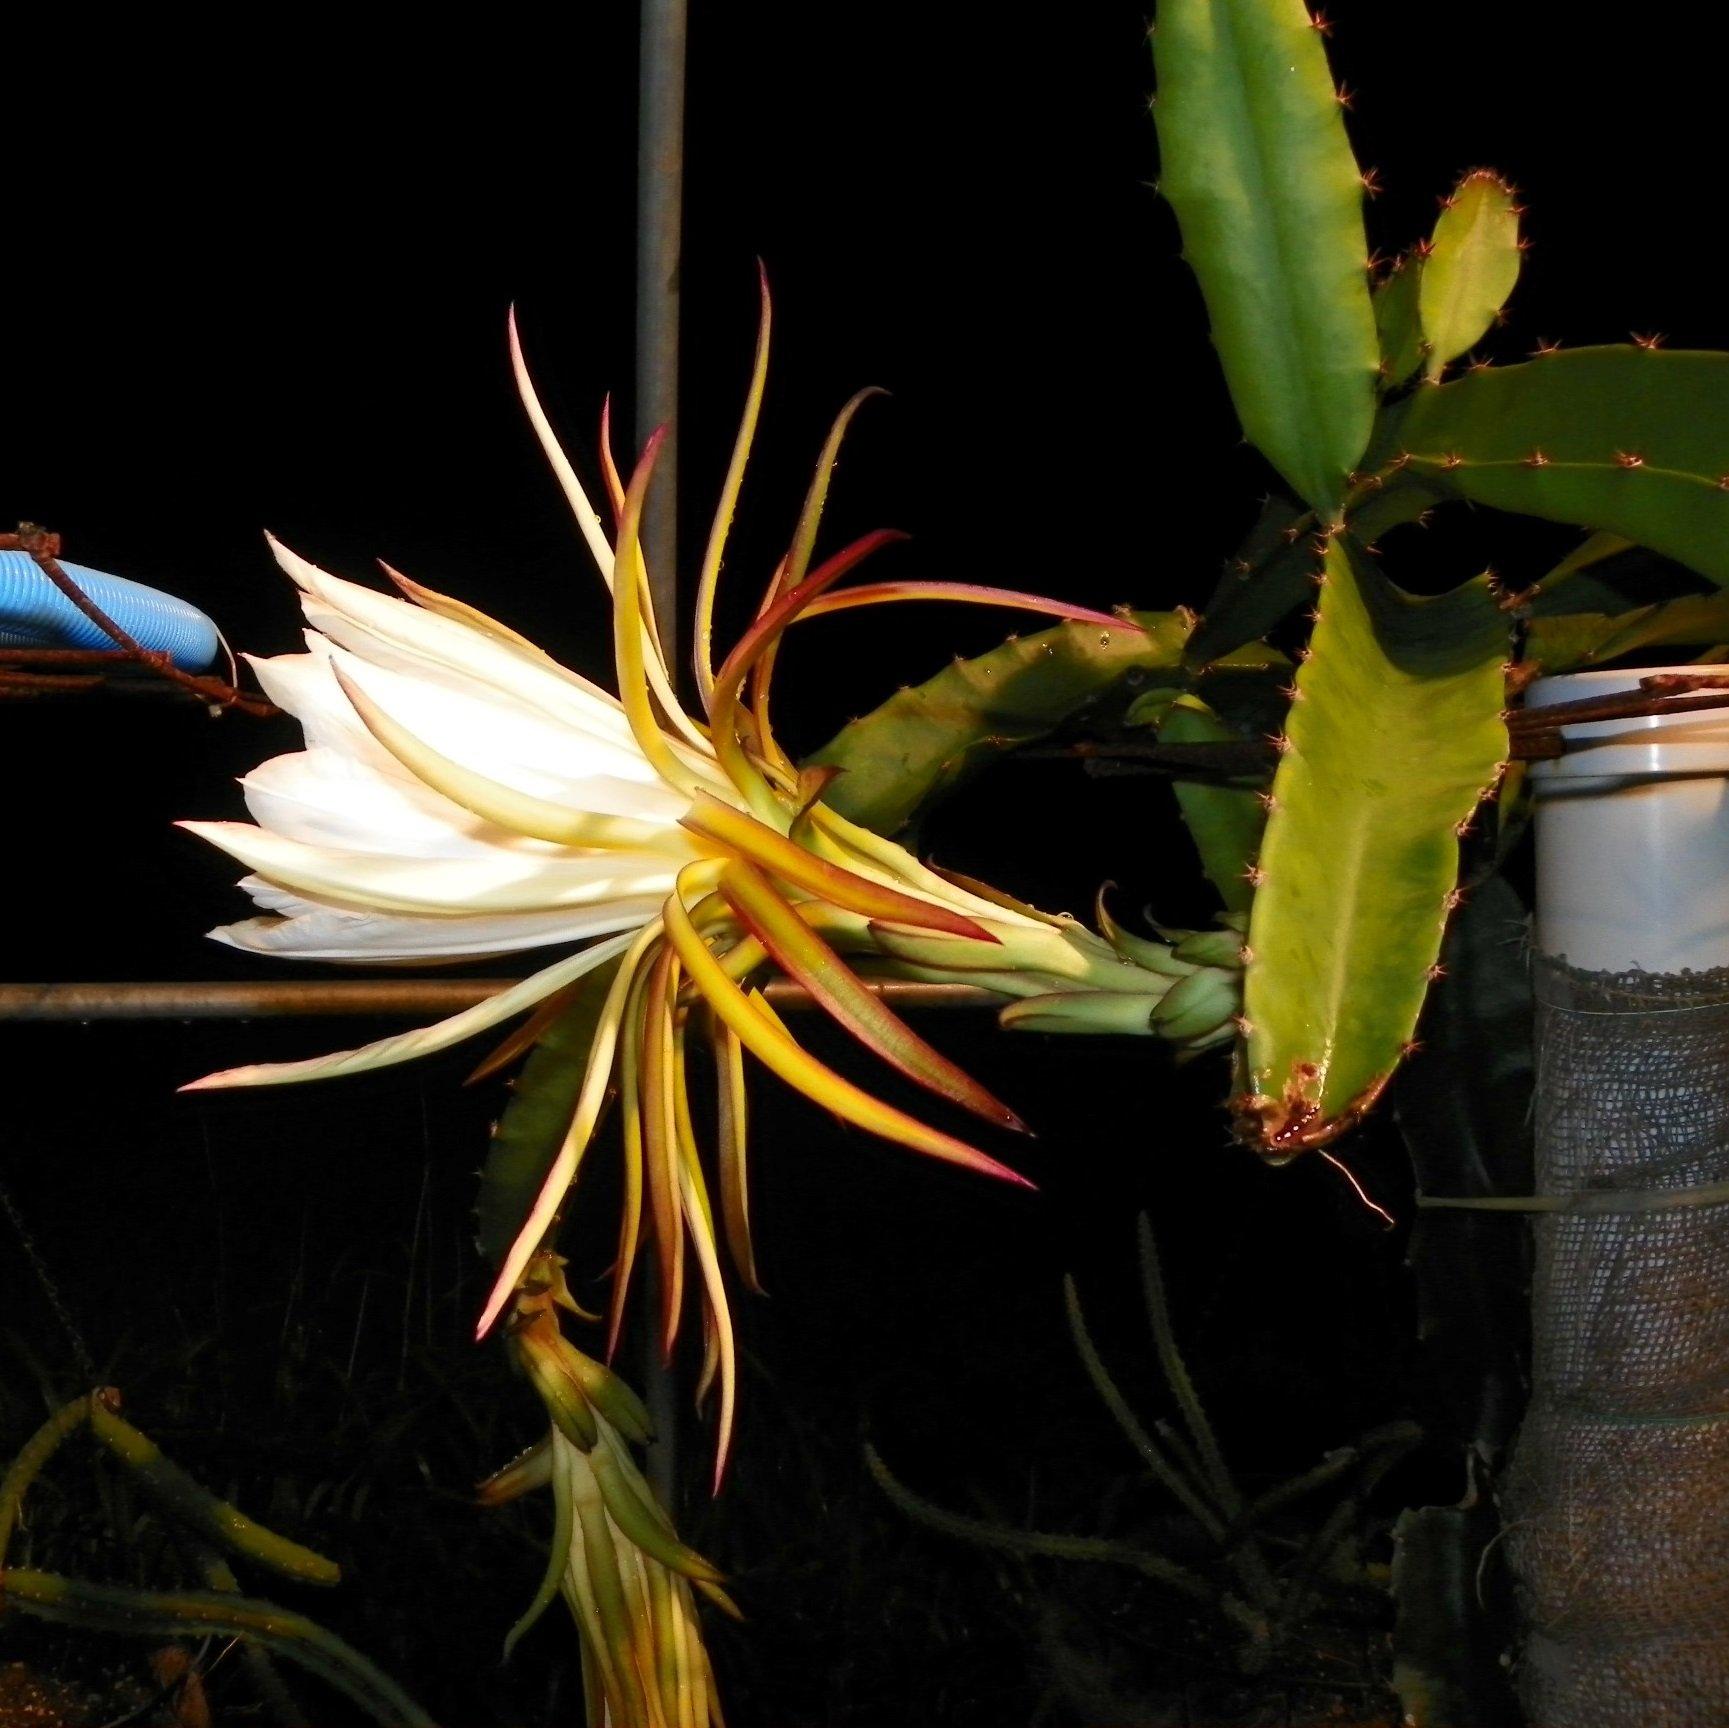 Armando Dragon Fruit variety flower